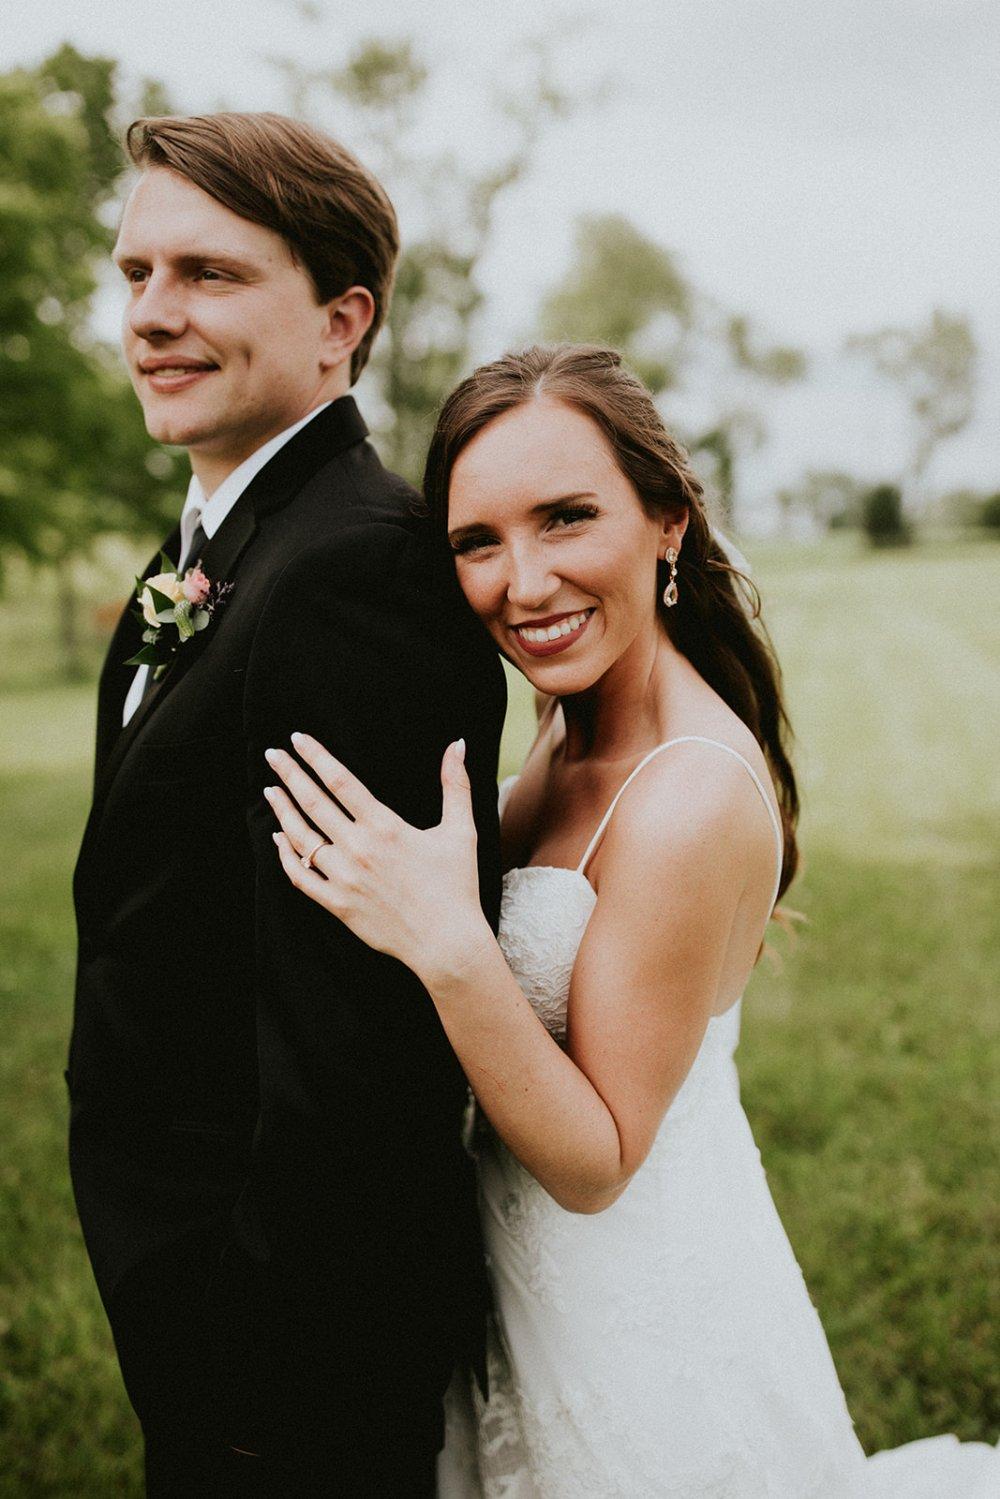 Calan-Adam-WEDDING-JUNE-2019-154.jpg